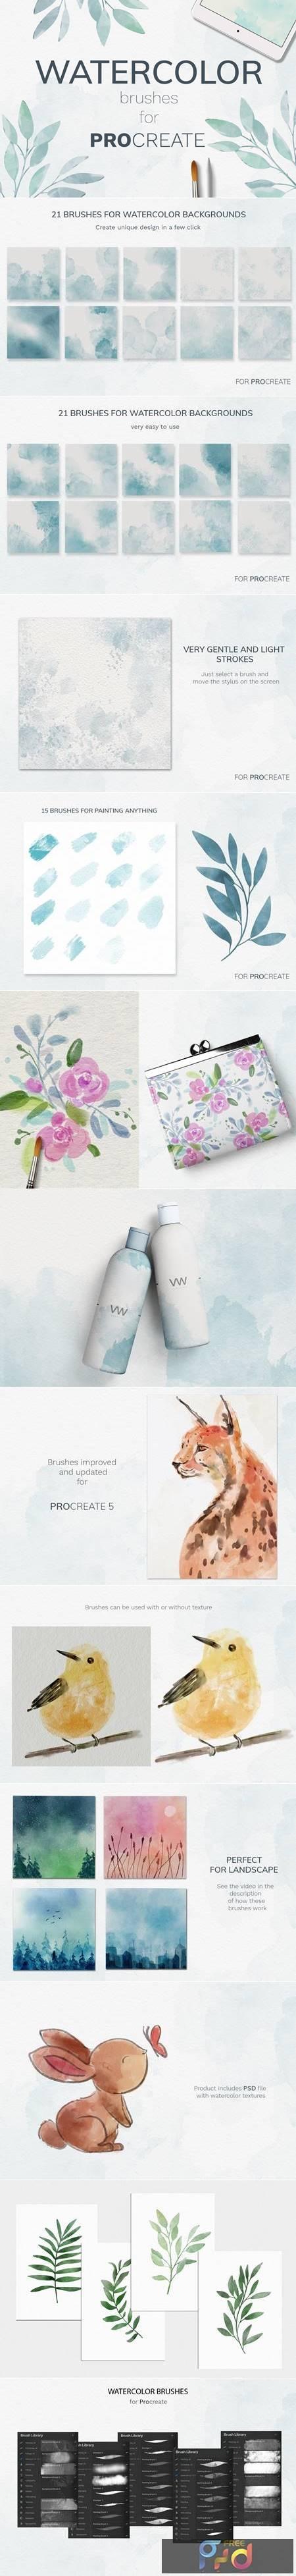 Procreate watercolor brush set 3995326 1